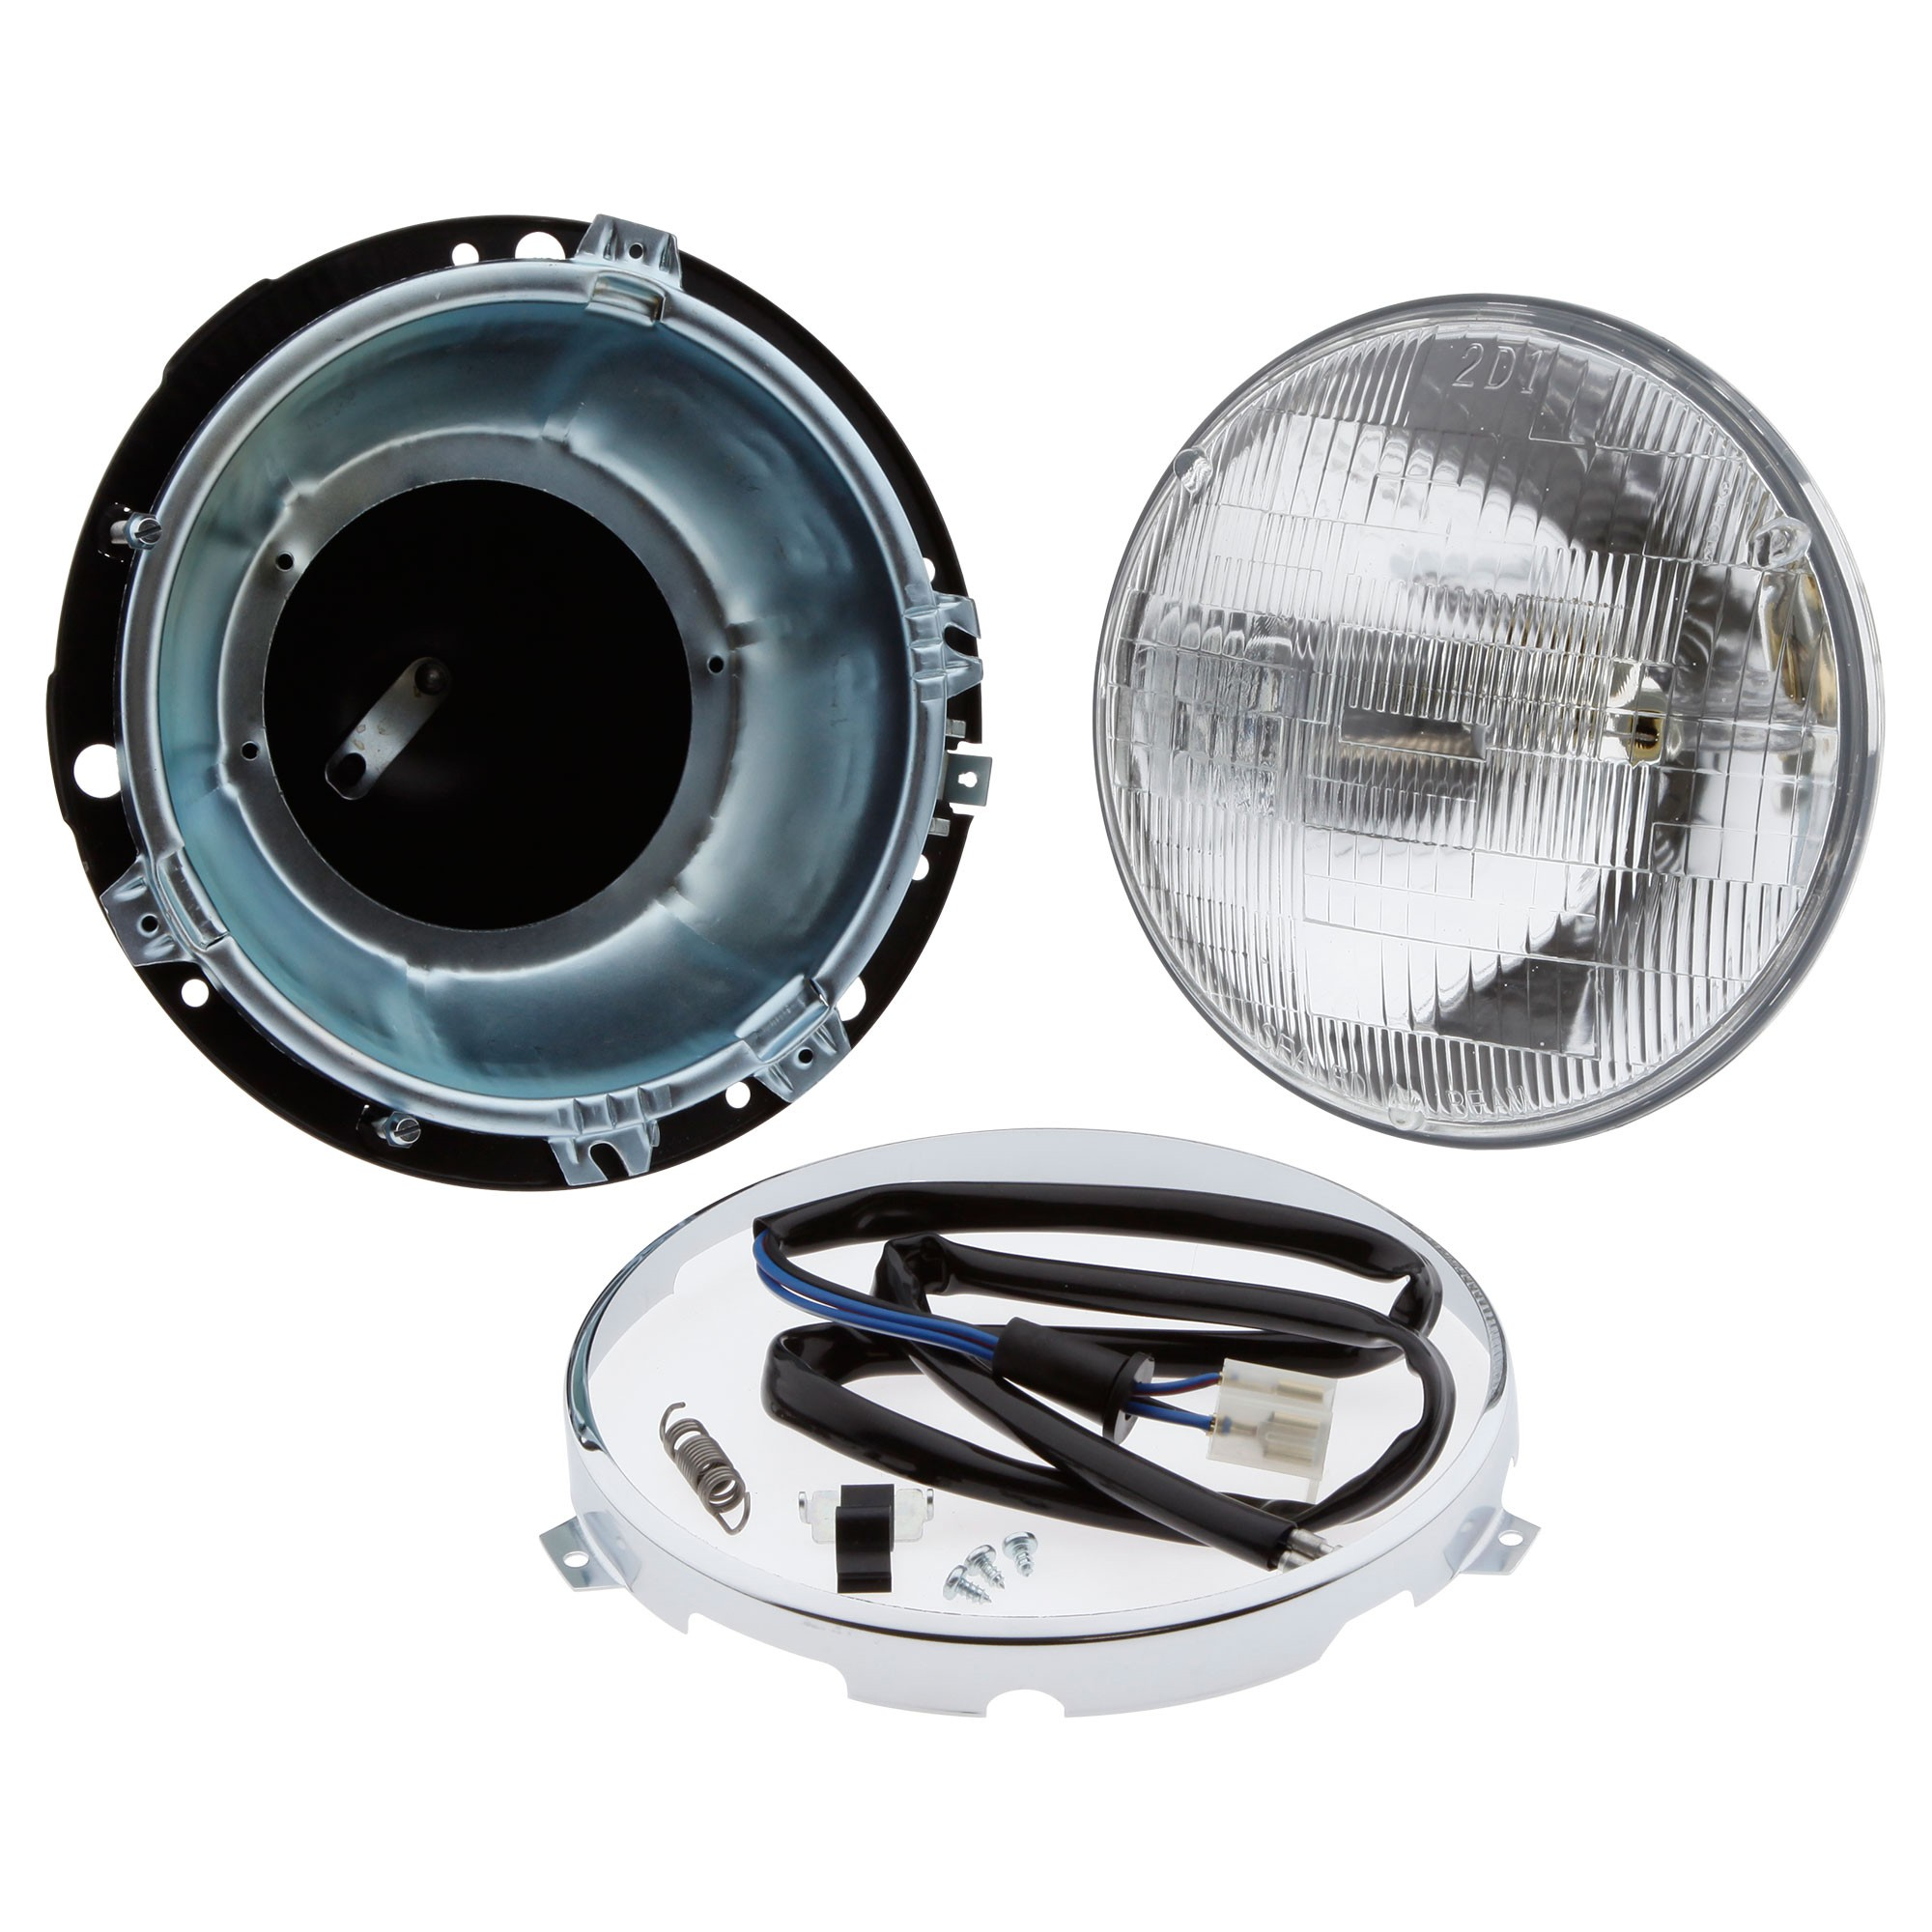 144 810 Headlamp Assembly Moss Motors